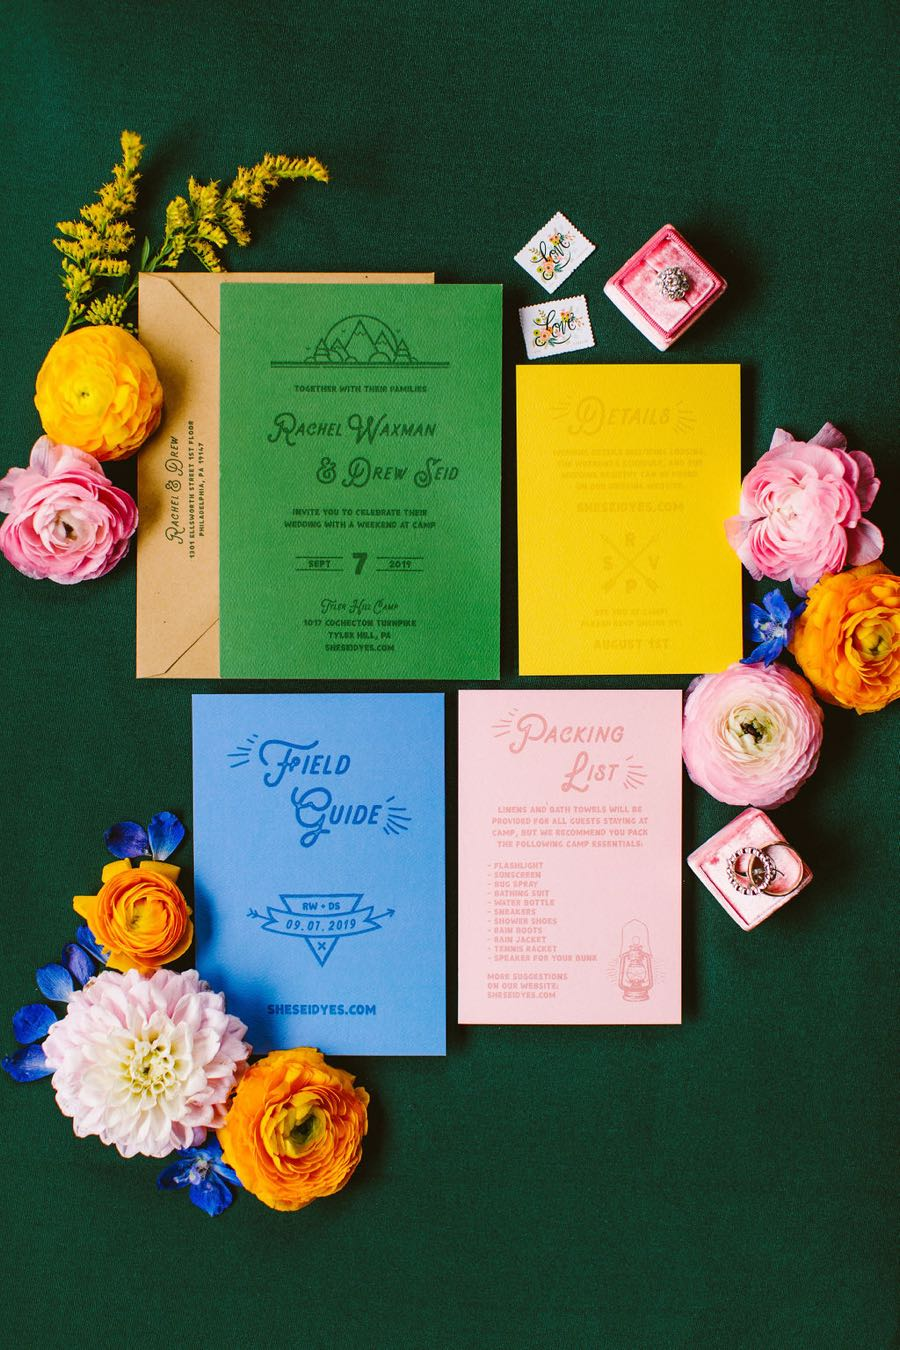 Clover Event Co. wedding invitations